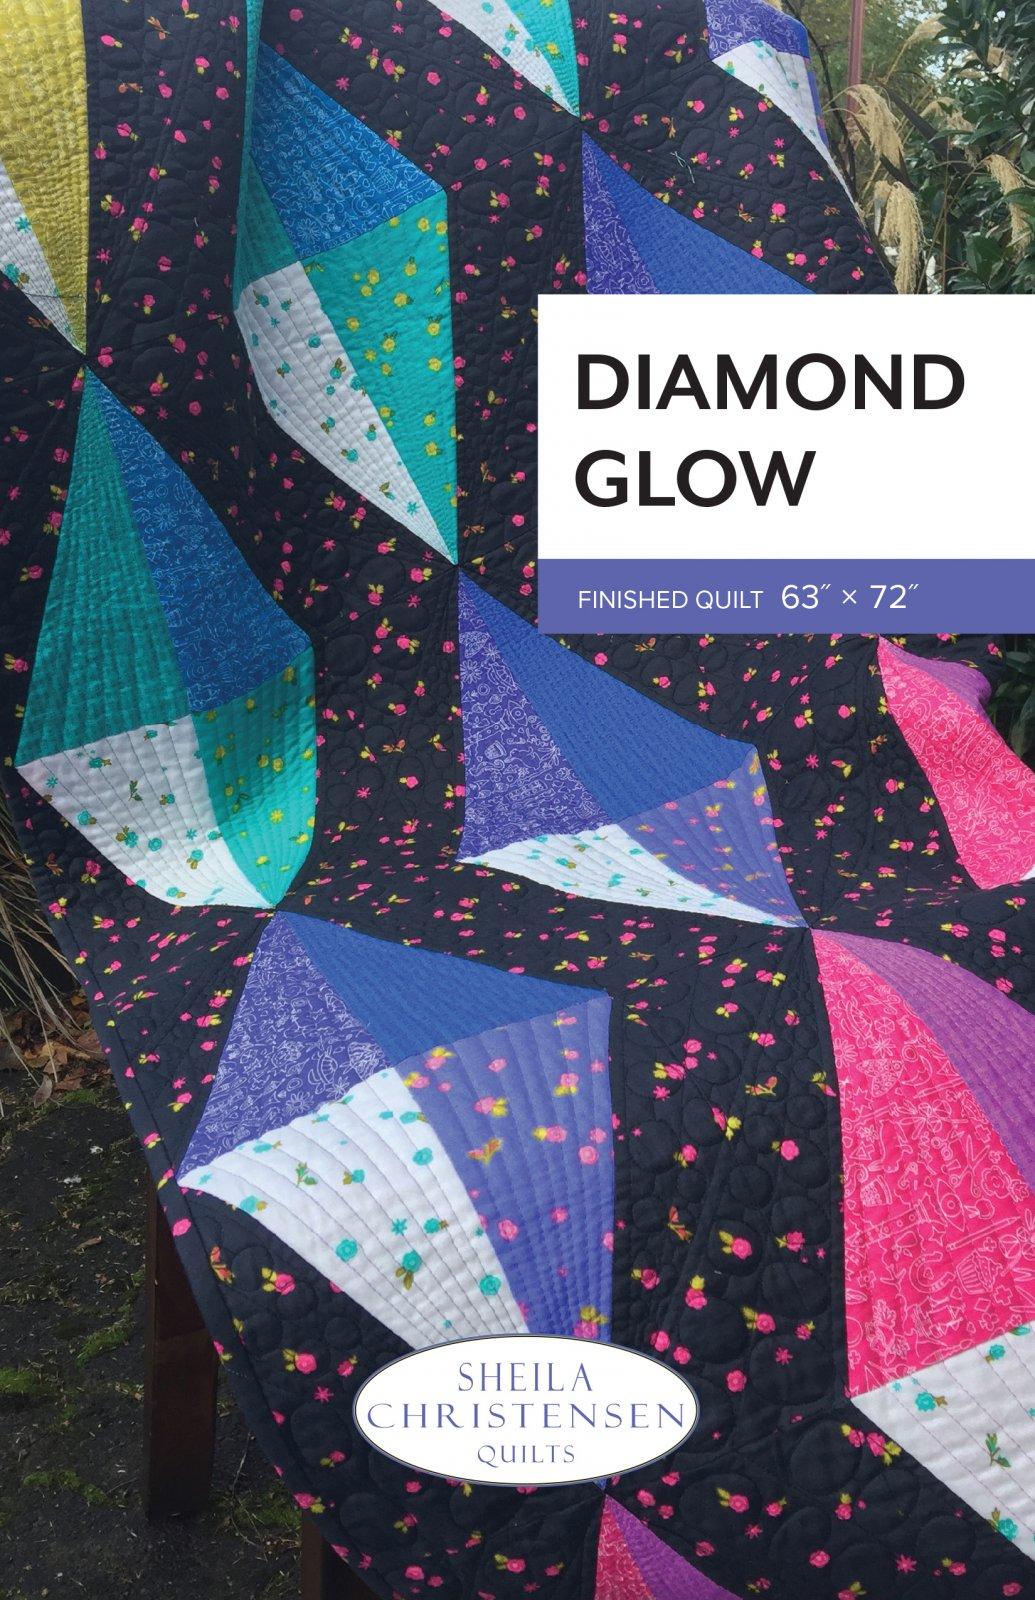 Diamond Glow Quilt Pattern